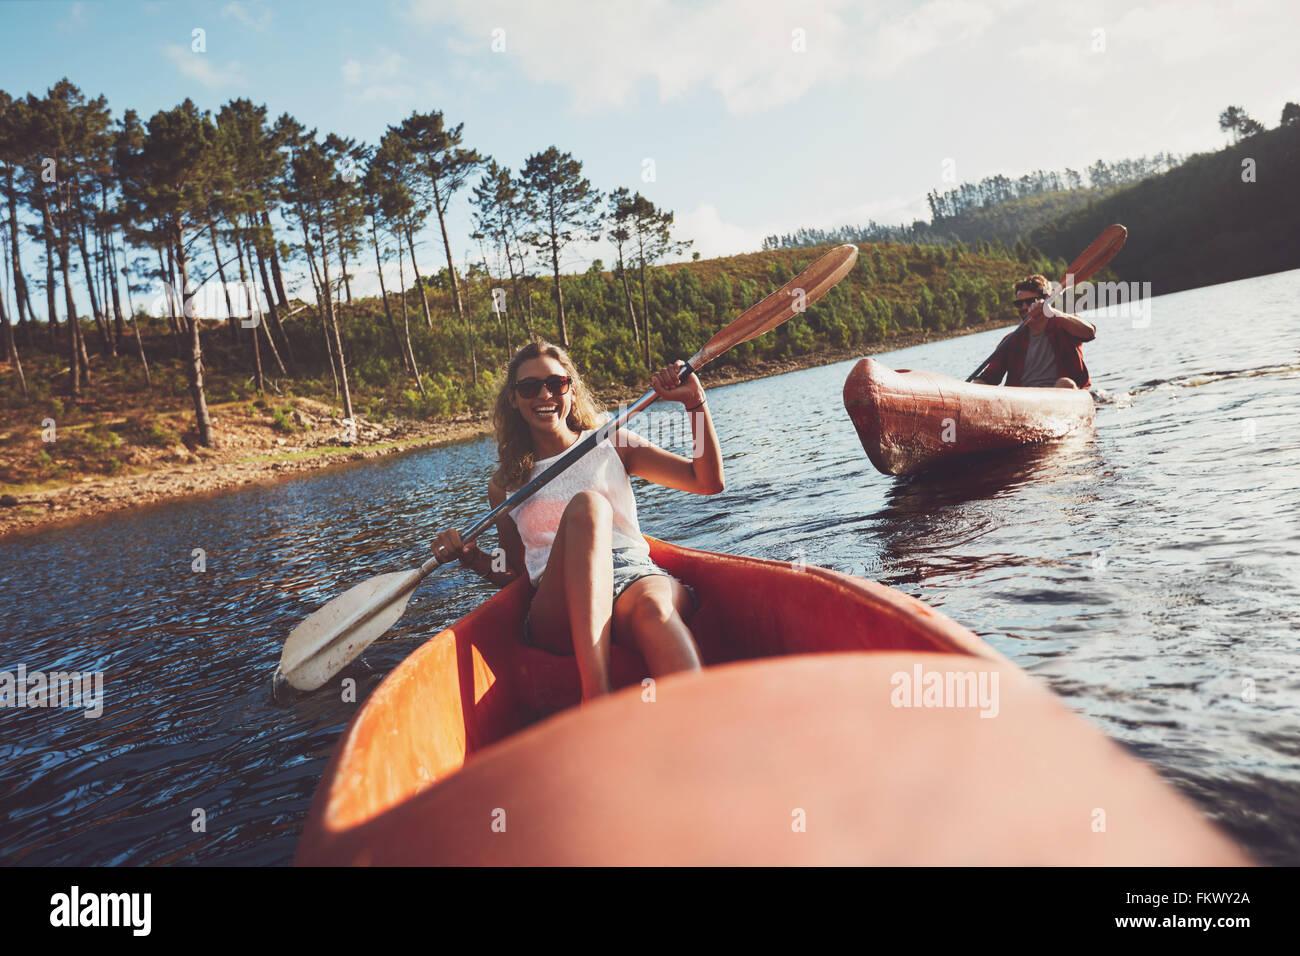 I giovani in kayak sul lago. Sorridente giovane donna kayakers con un uomo canoa kayak in background. Immagini Stock